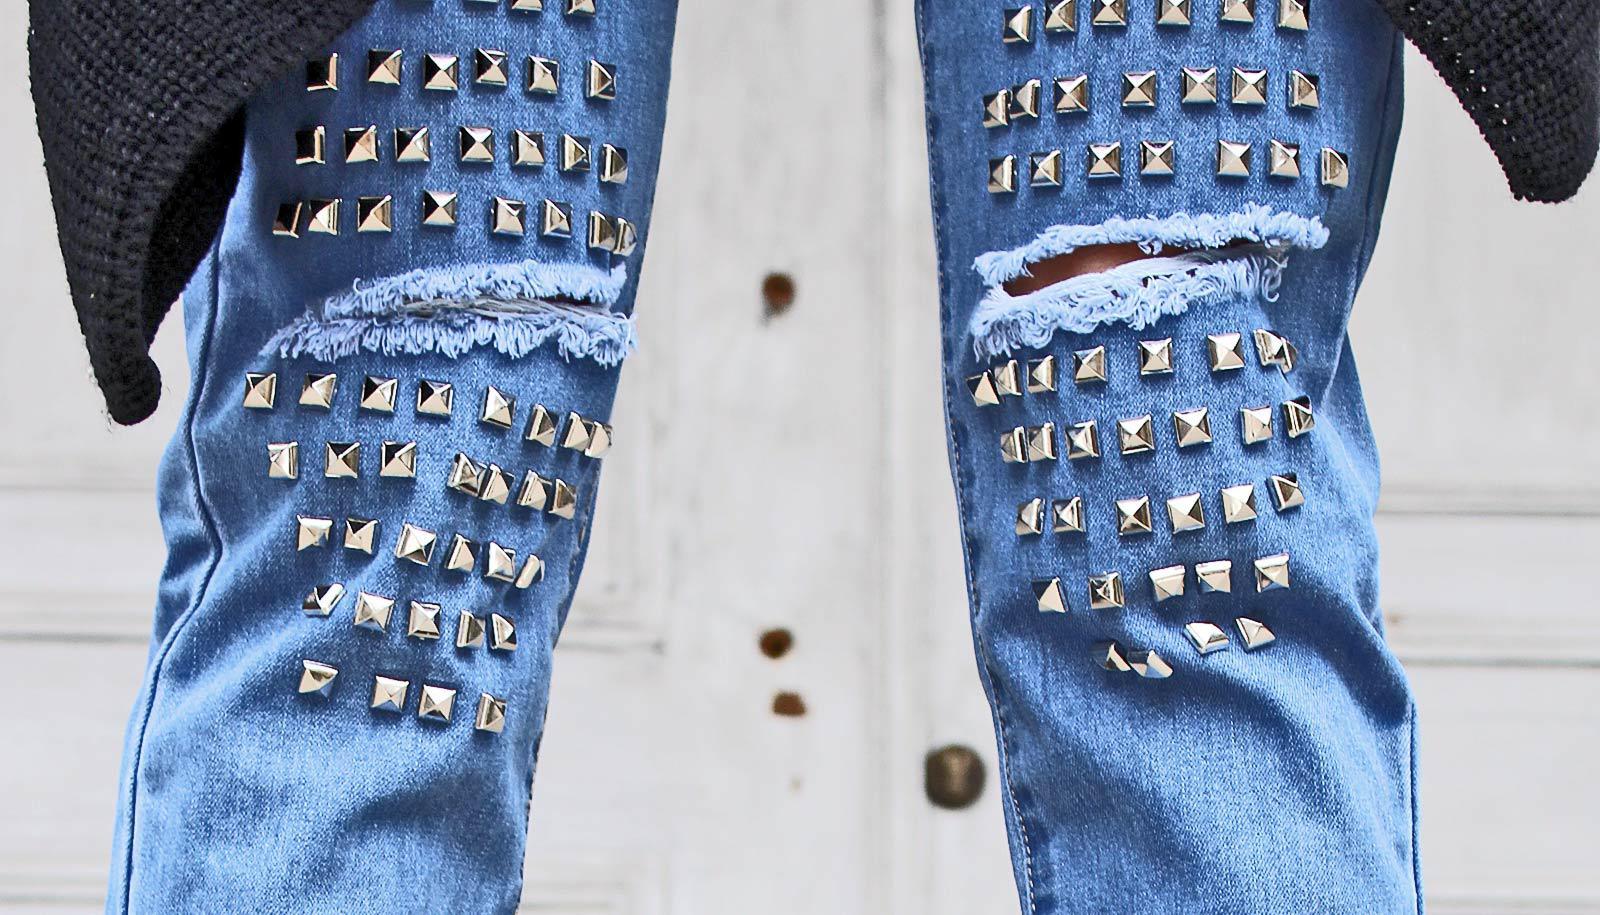 studded jeans on legs - Entamoeba histolytica concept